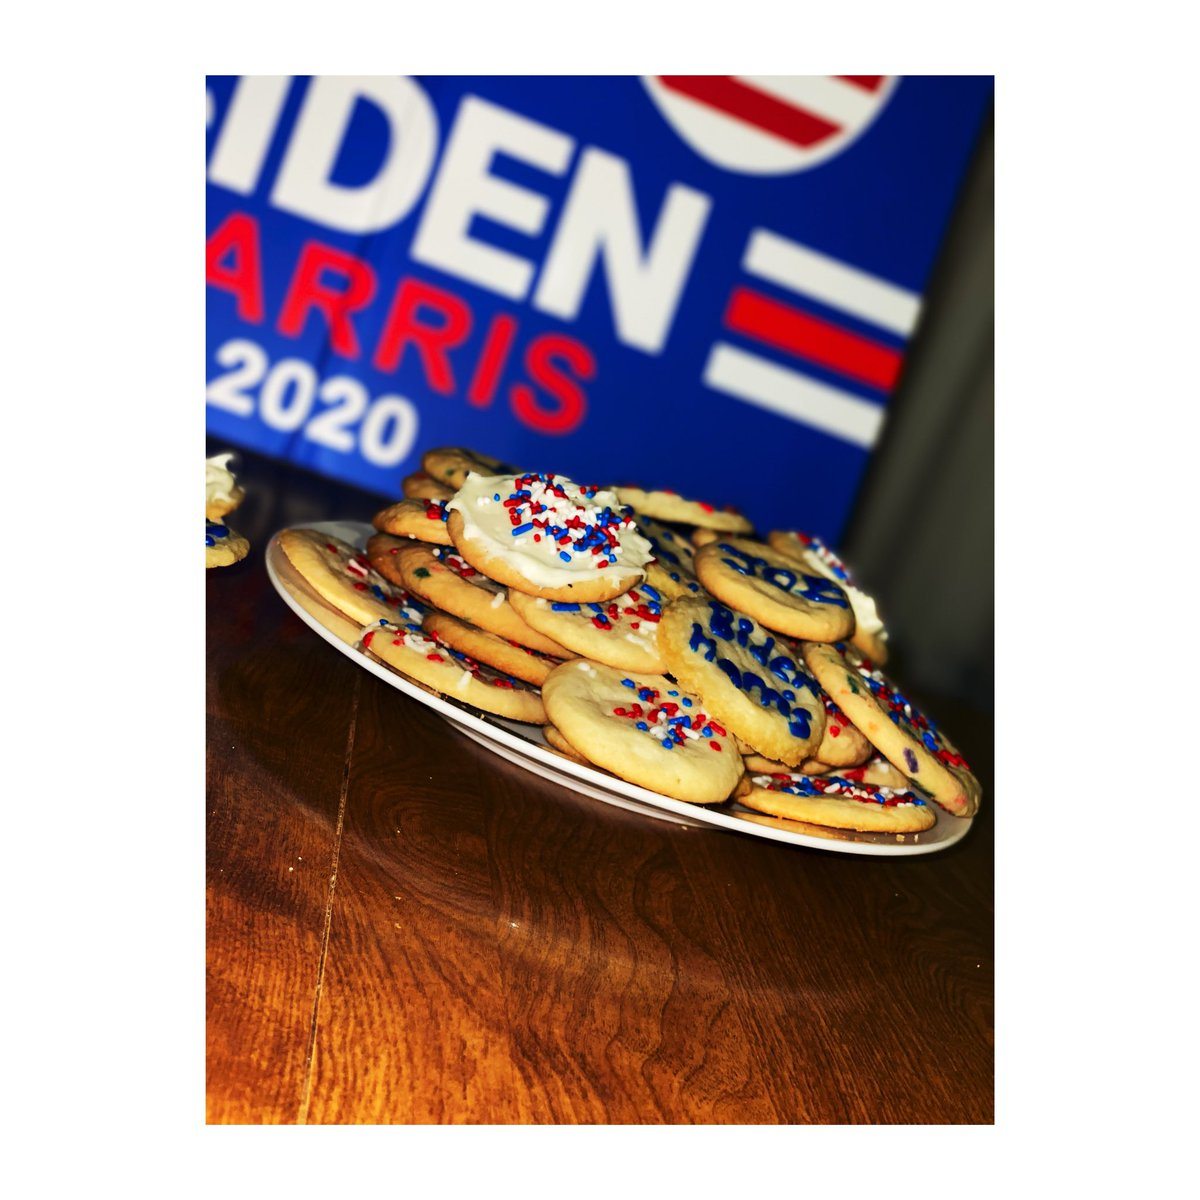 Sneak peek of the 46 #Inauguration2021 cookies I've made!!!  #BidenHarrisInauguration  @JoeBiden @DrBiden @meenaharris @KamalaHarris @DouglasEmhoff